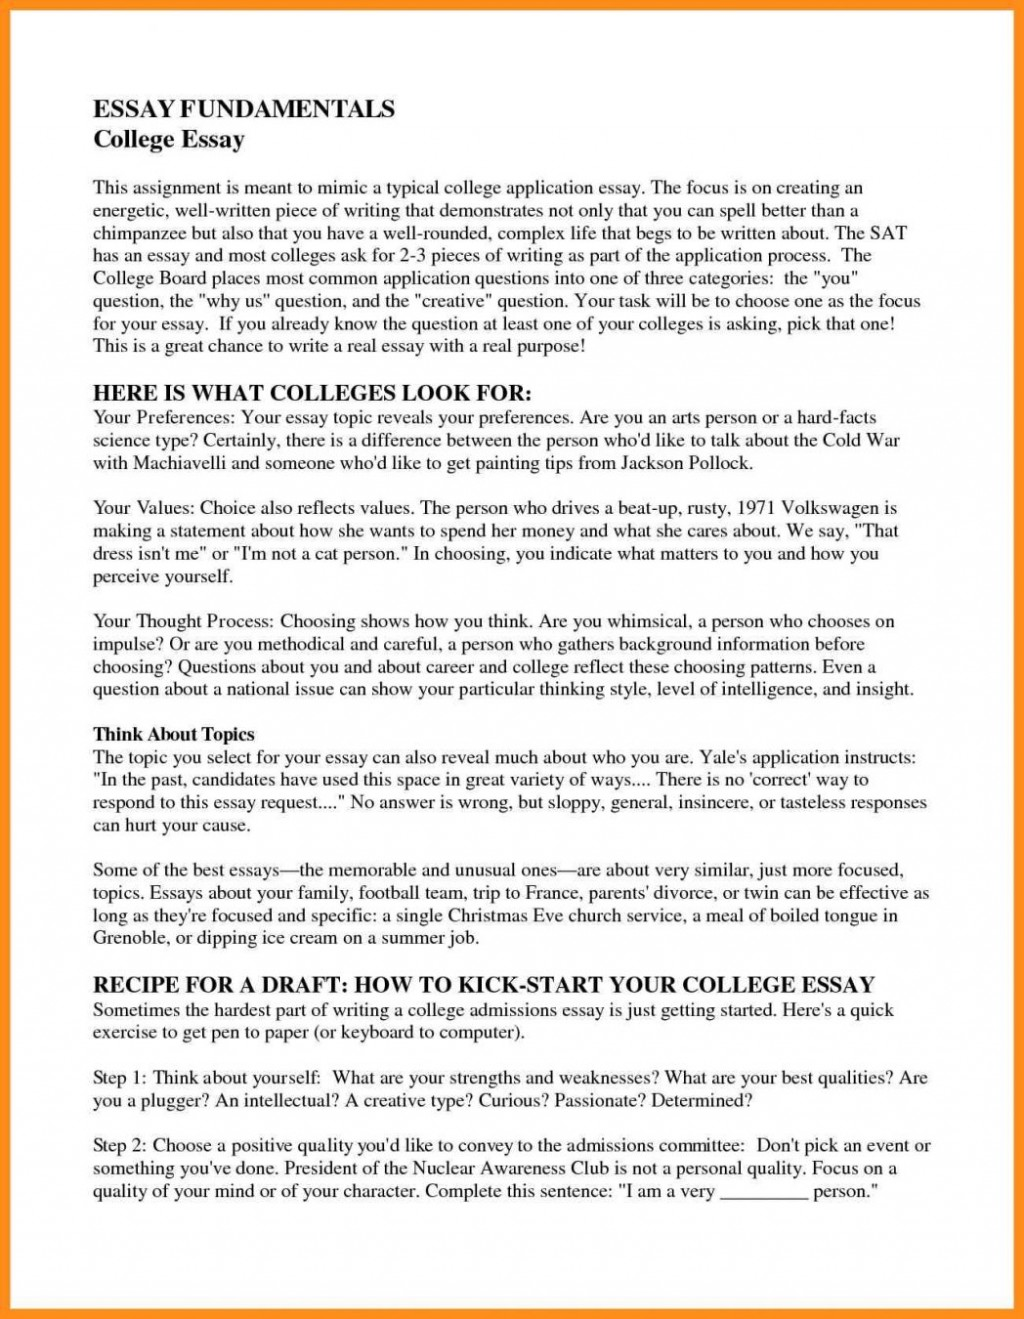 001 Essay Example Write Essays For Money Goal Blockety Co Writing College Newest Depict Jlirxaj Cash Best Uni Scholarship Large